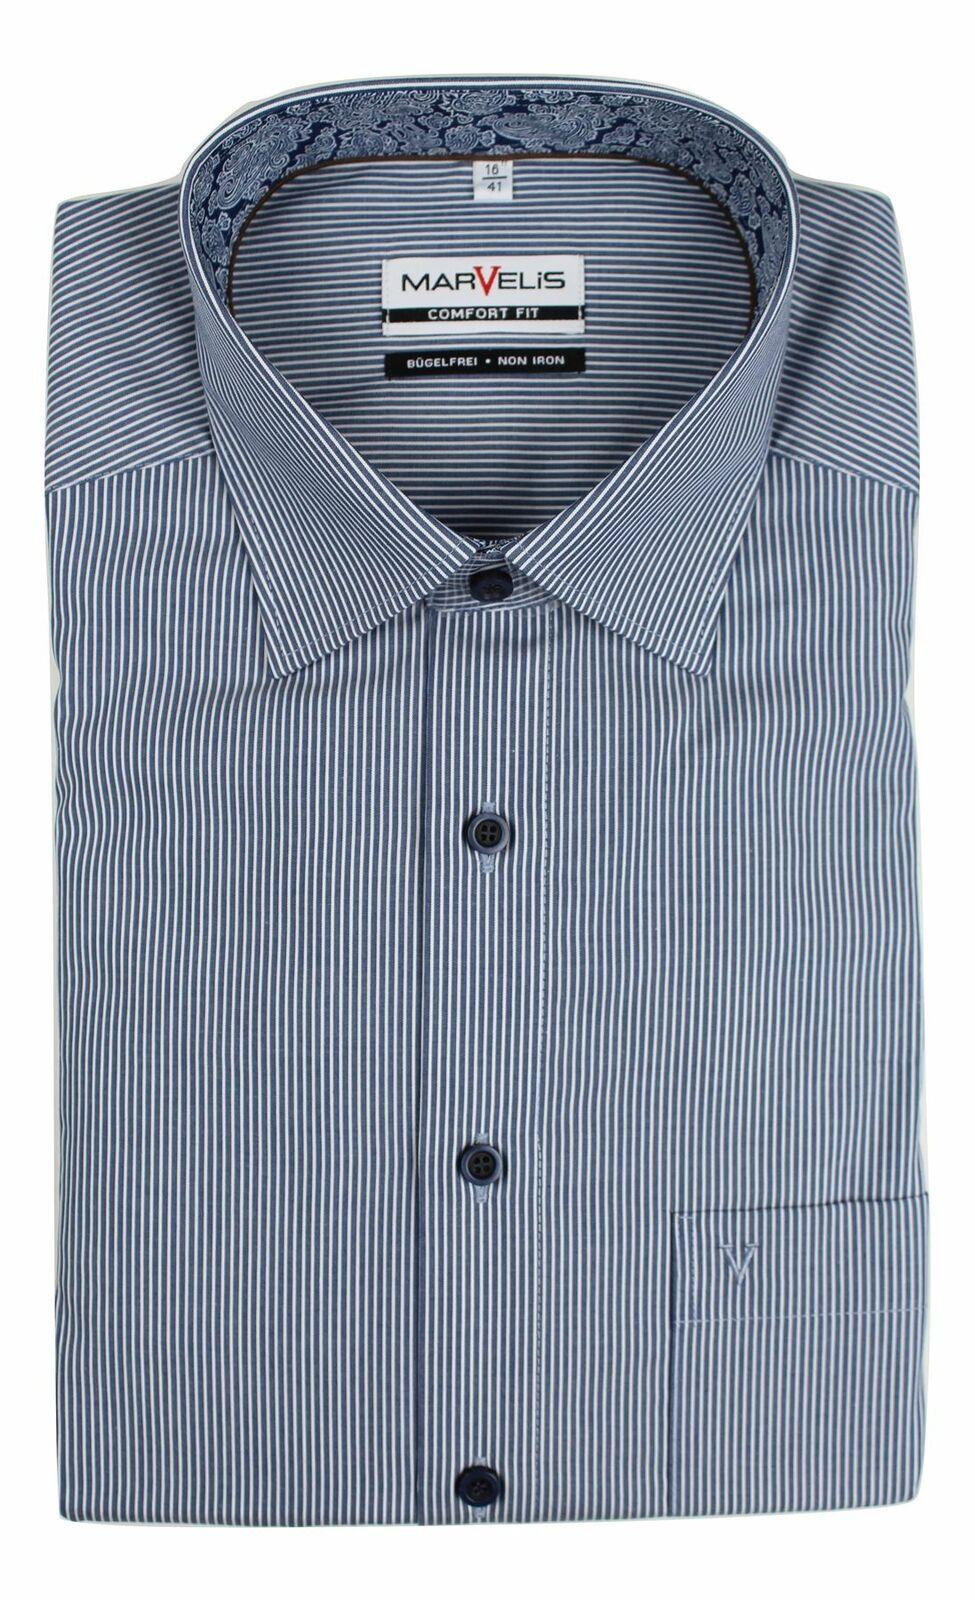 Denim Stripe (Paisley) Spread Collar